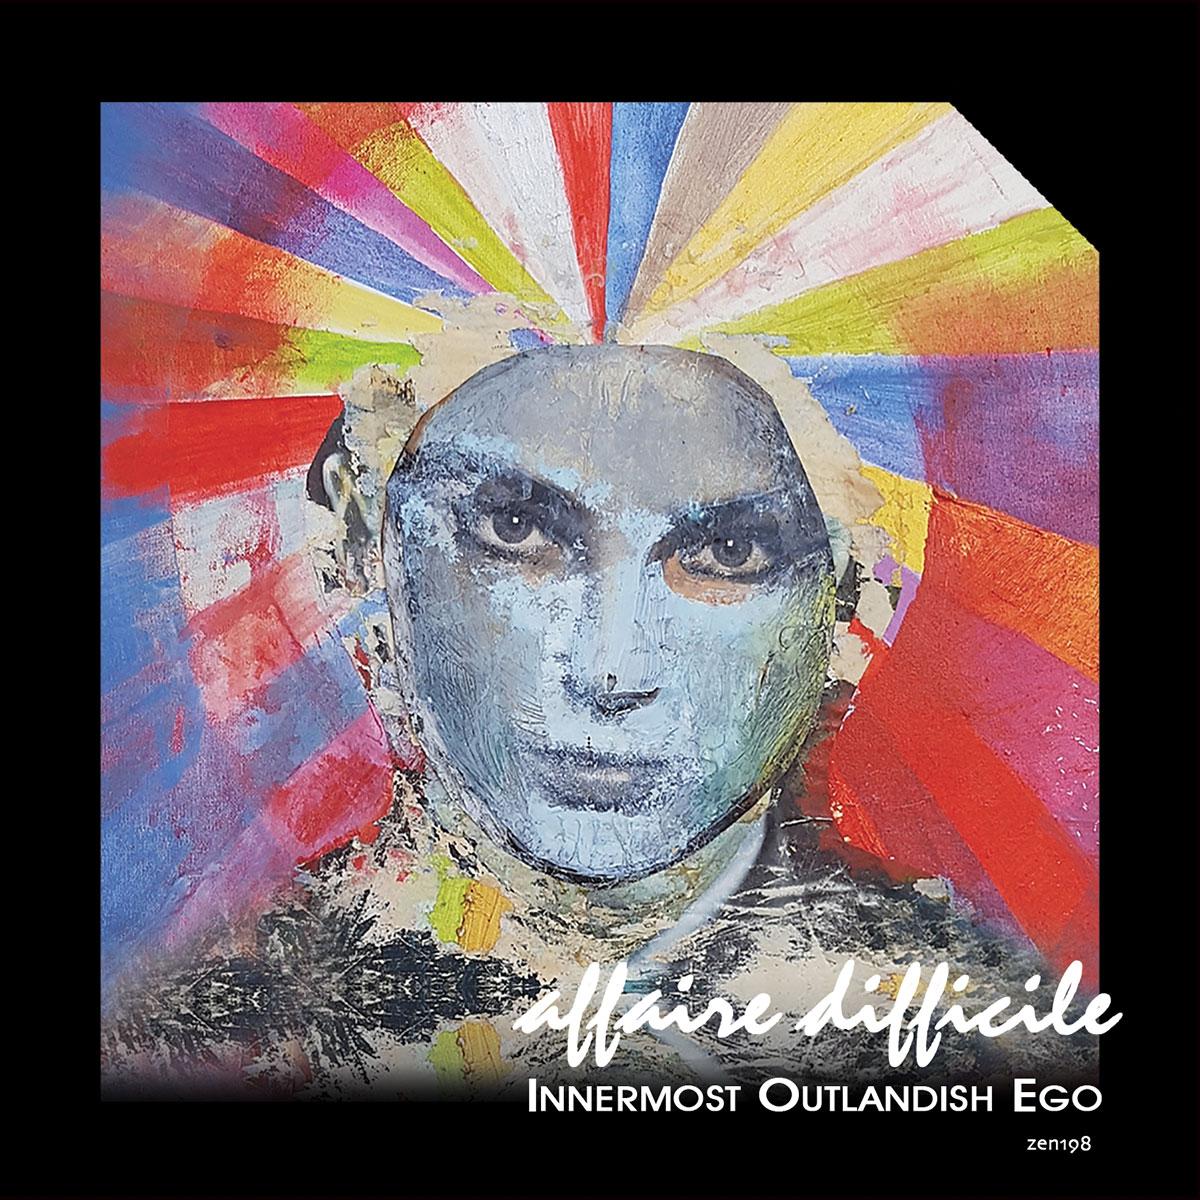 affaire difficile – Innermost Outlandish Ego